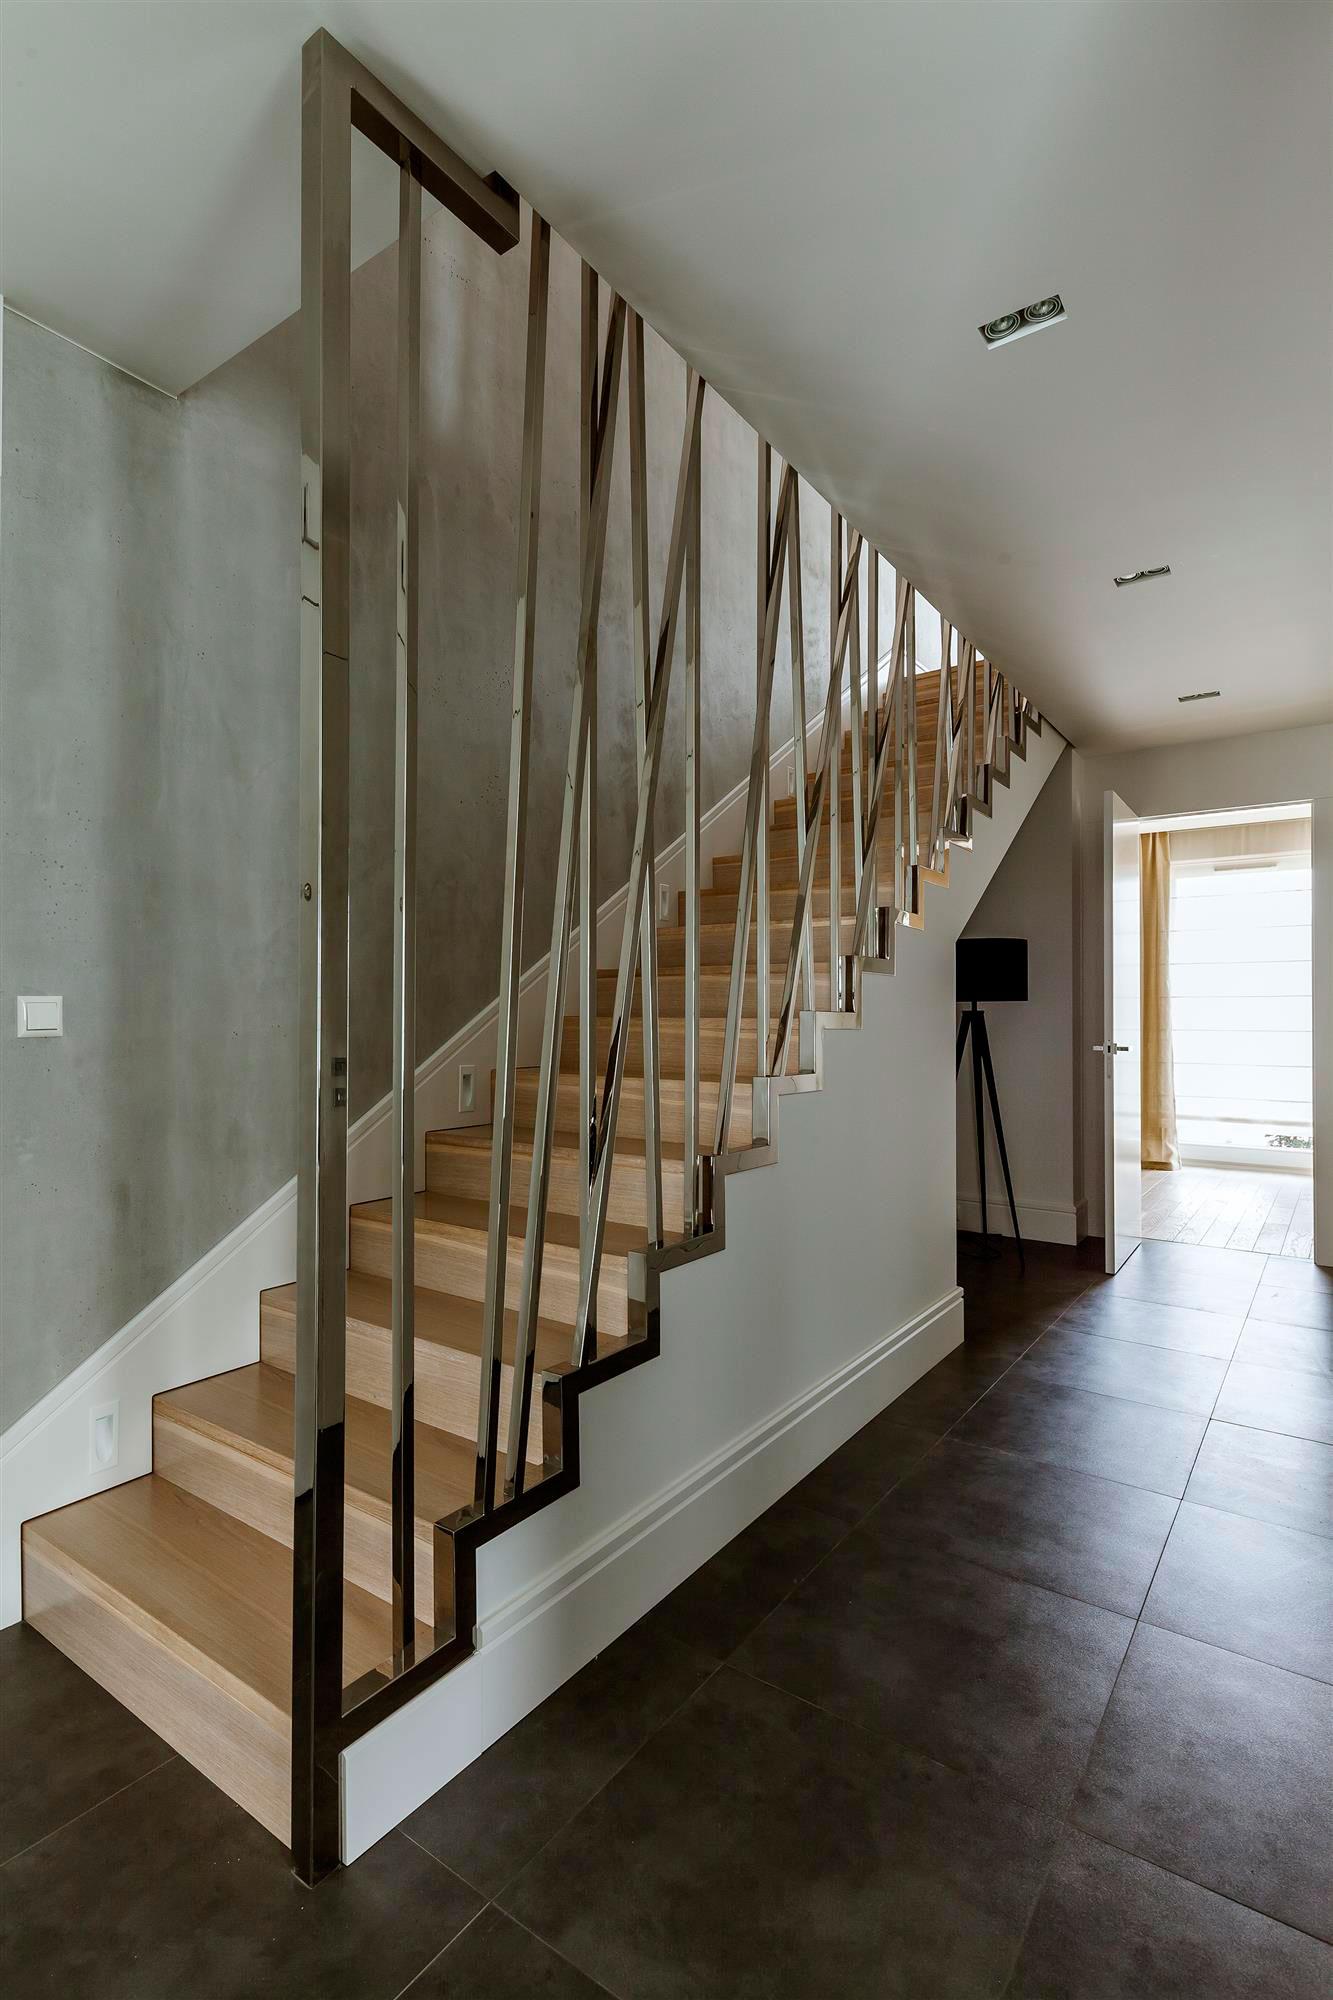 Apartment in Warsaw by Hola Design | Homedezen